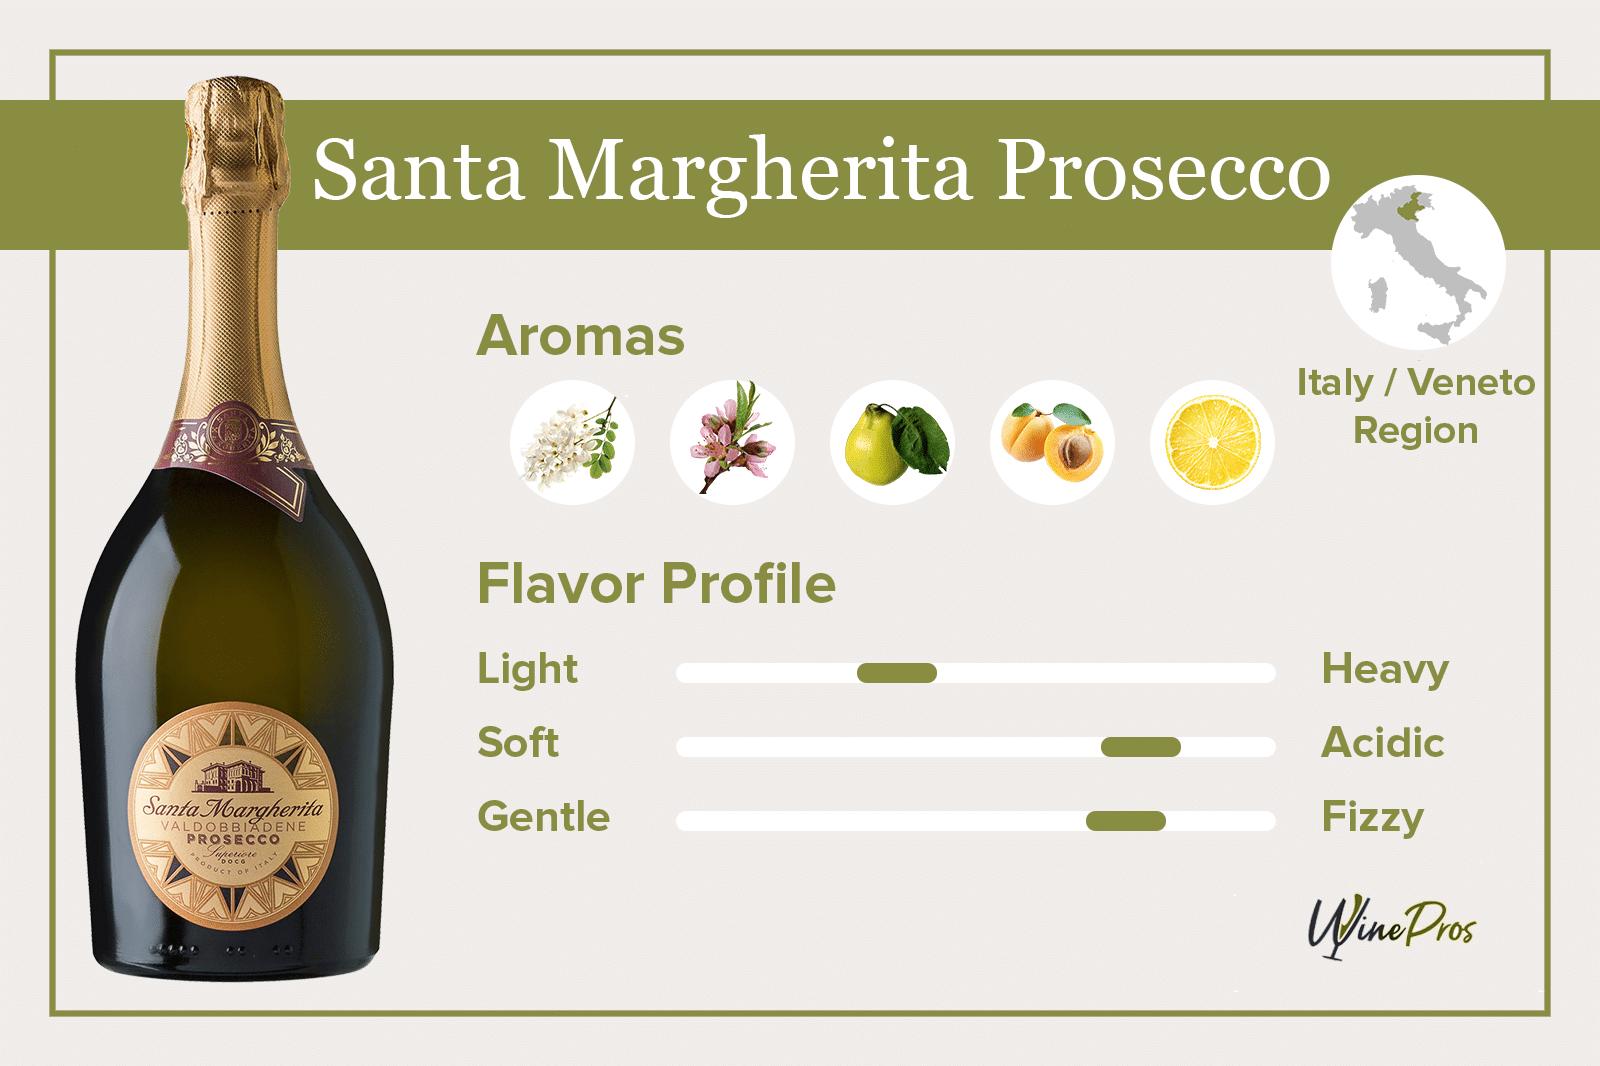 Santa Margherita Prosecco Featured